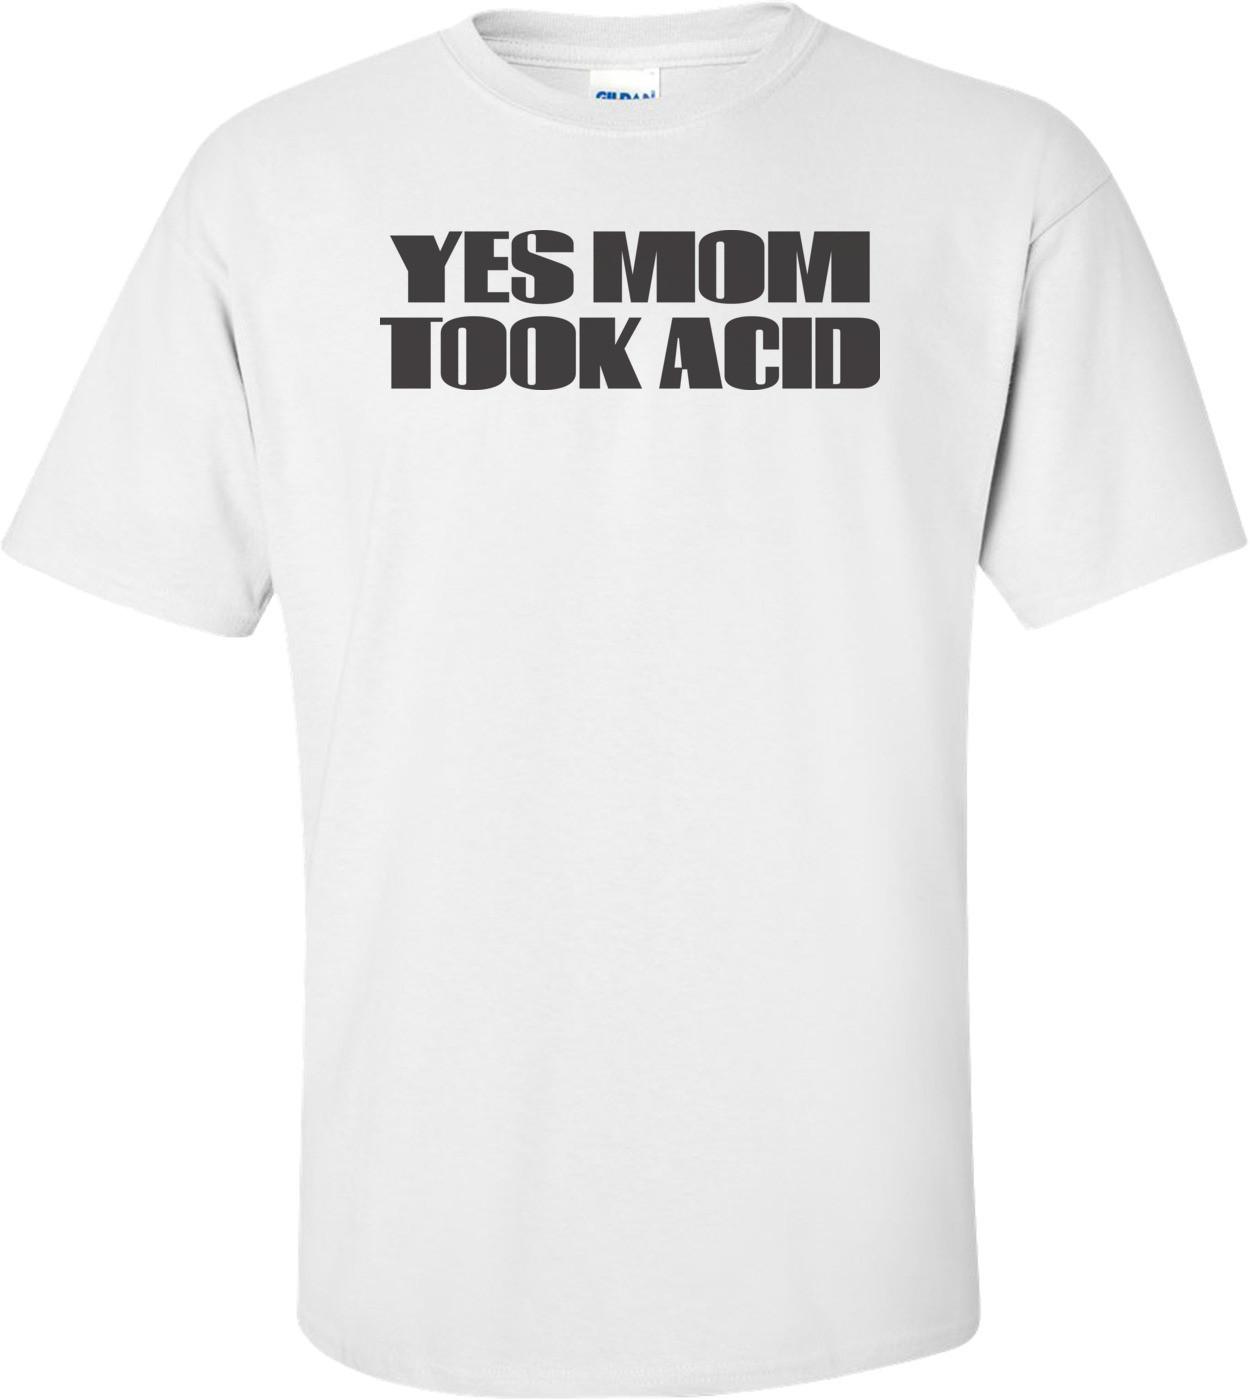 Yes Mom Took Acid